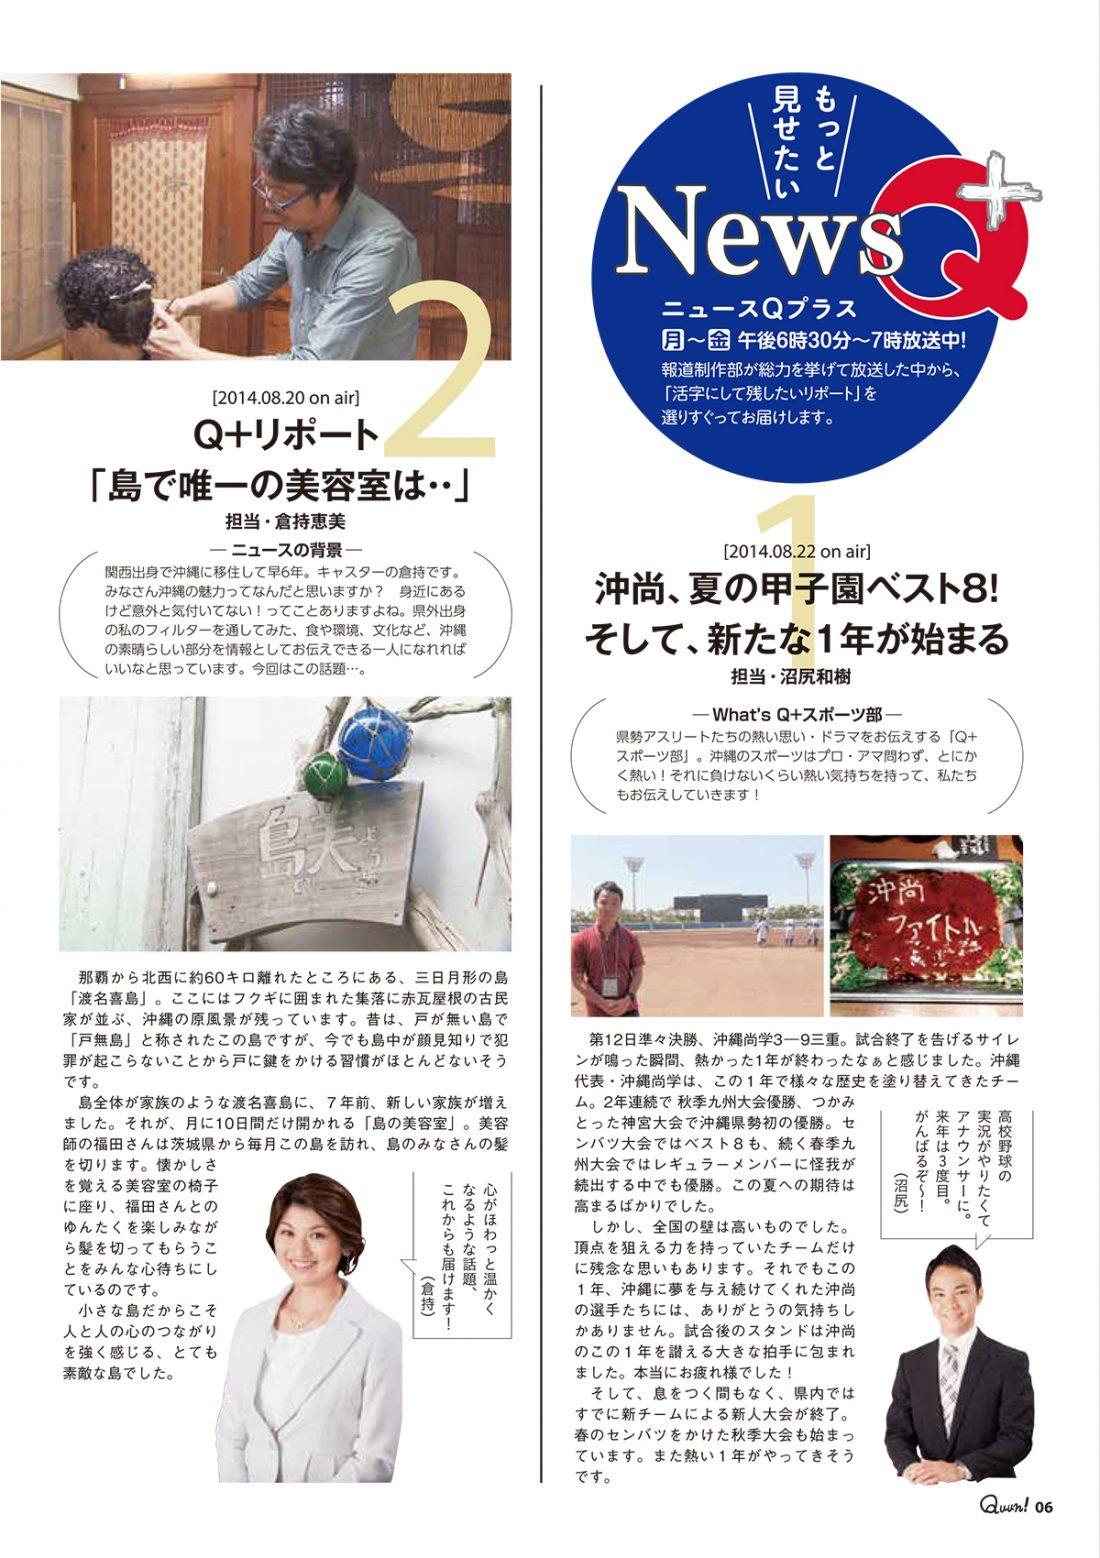 https://www.qab.co.jp/qgoro/wp-content/uploads/quun_0208-1100x1558.jpg